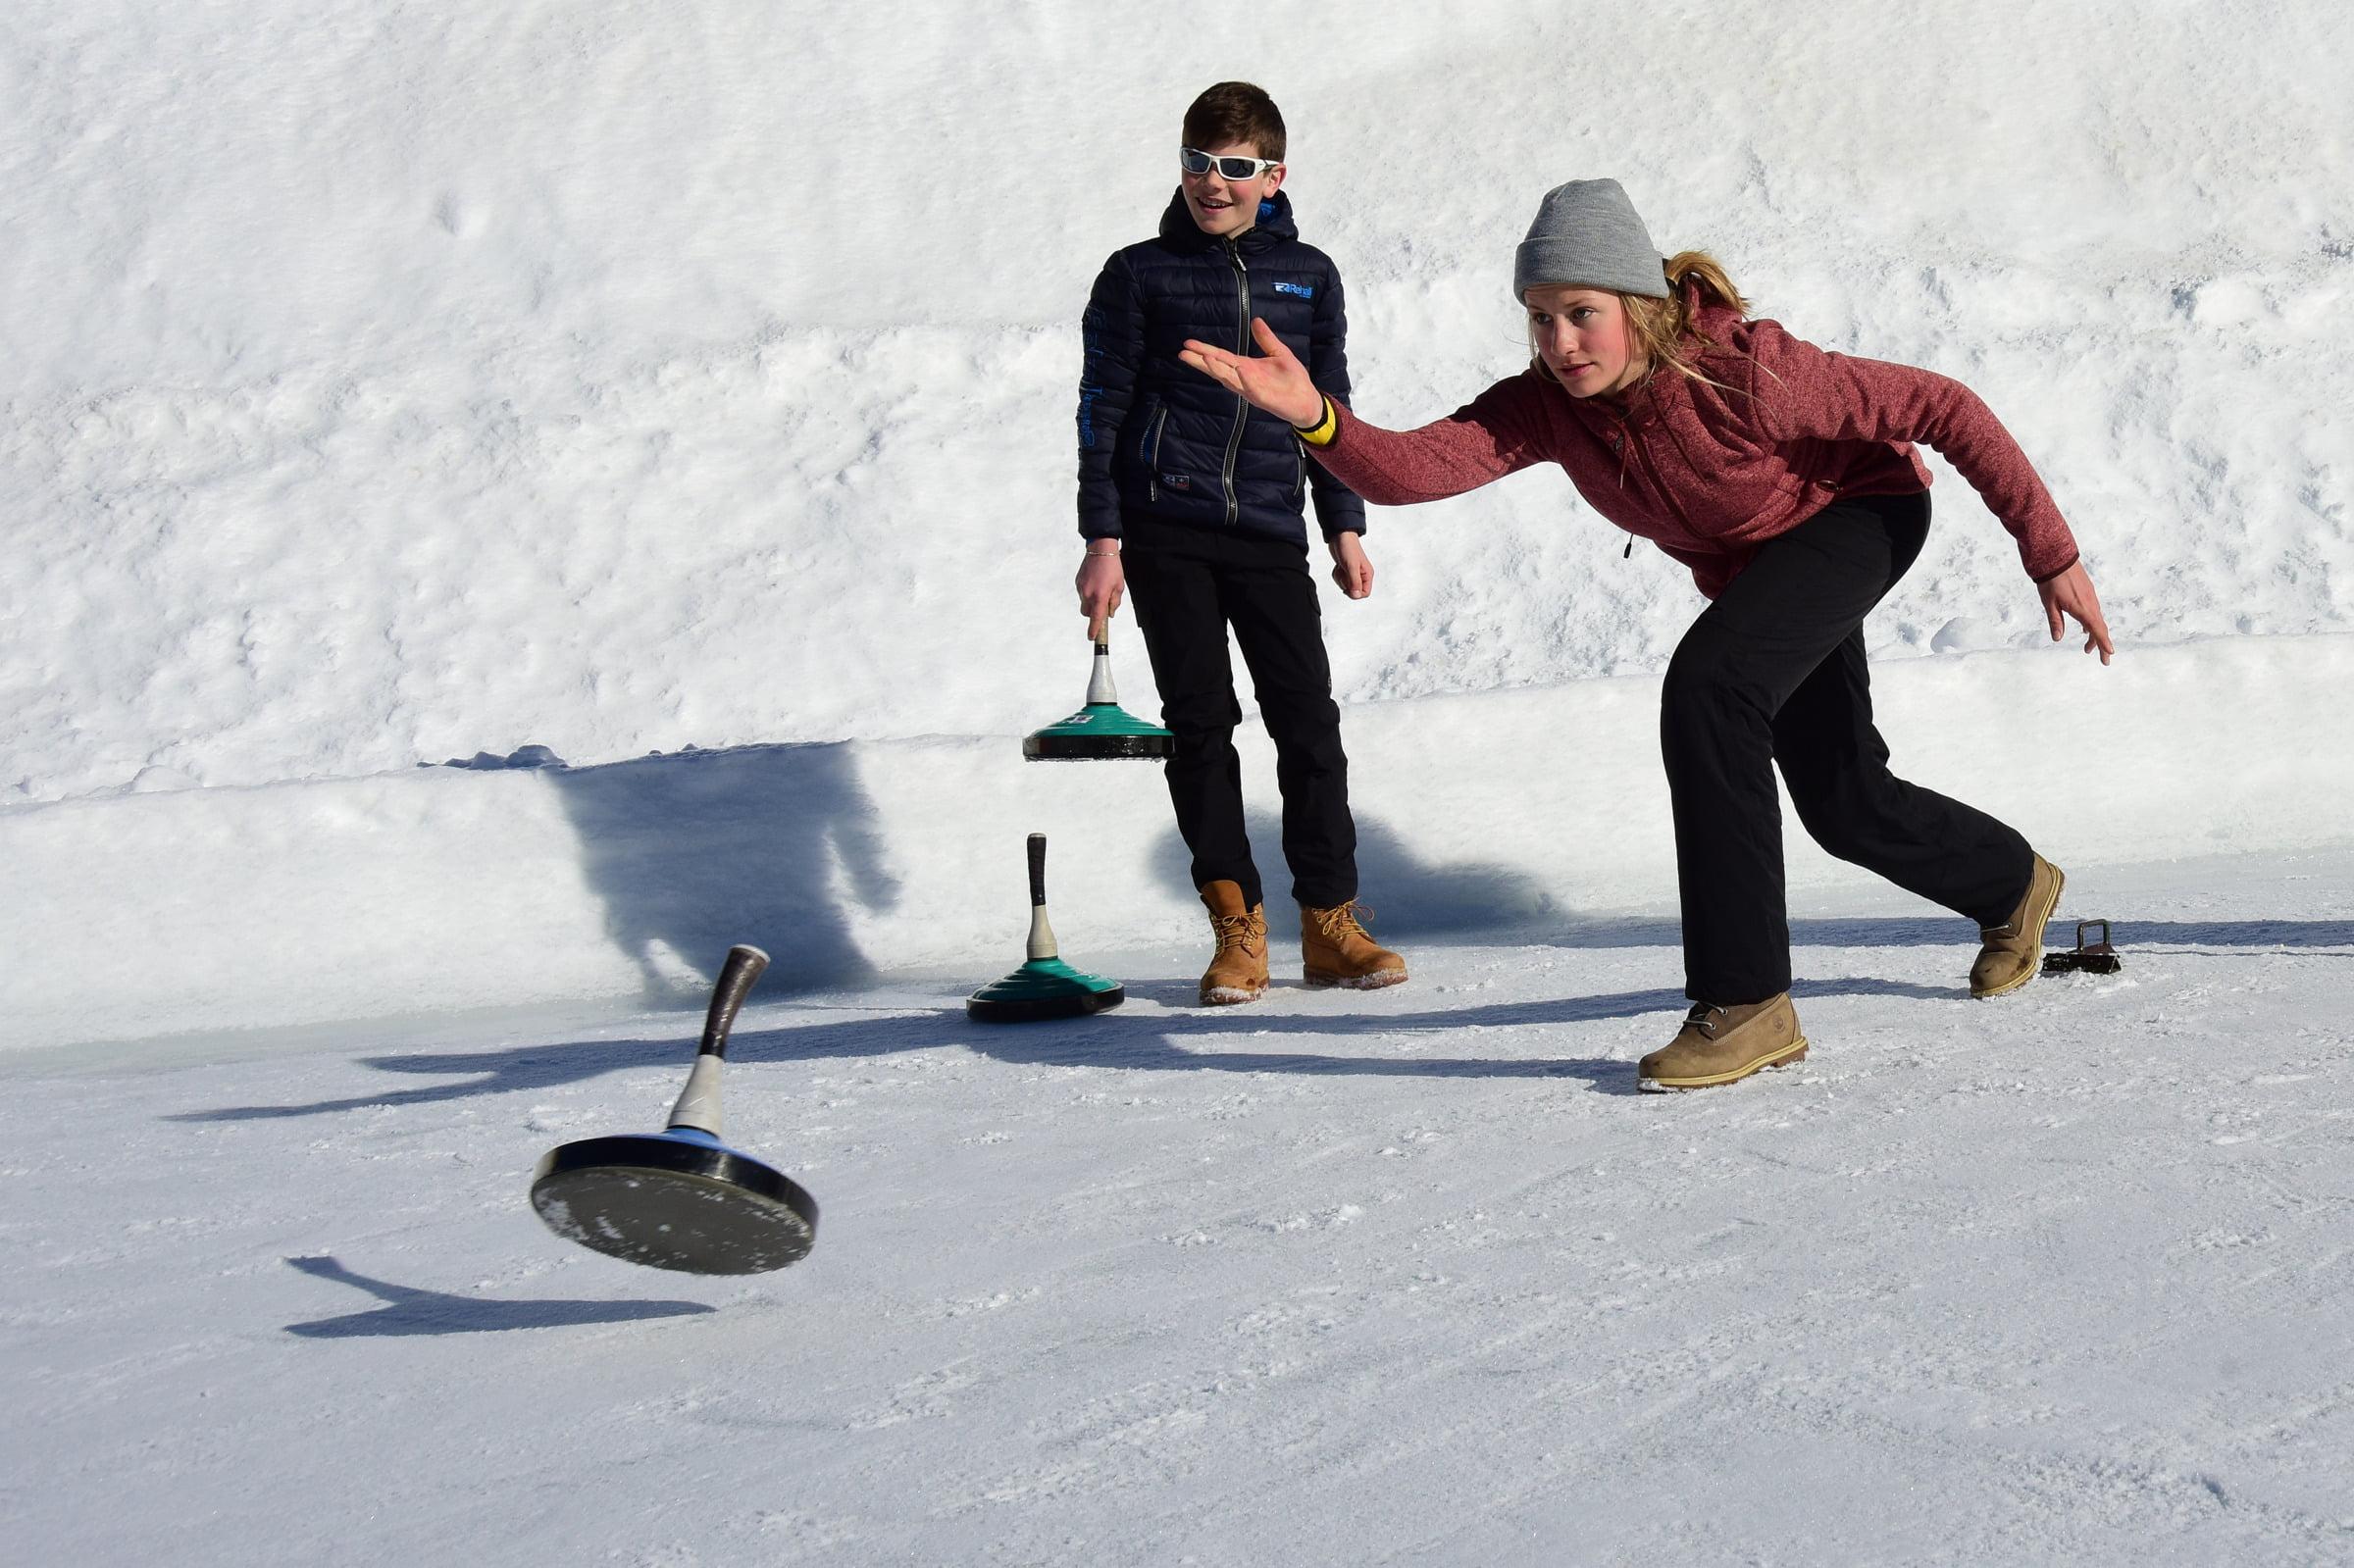 Wintersport Tradition